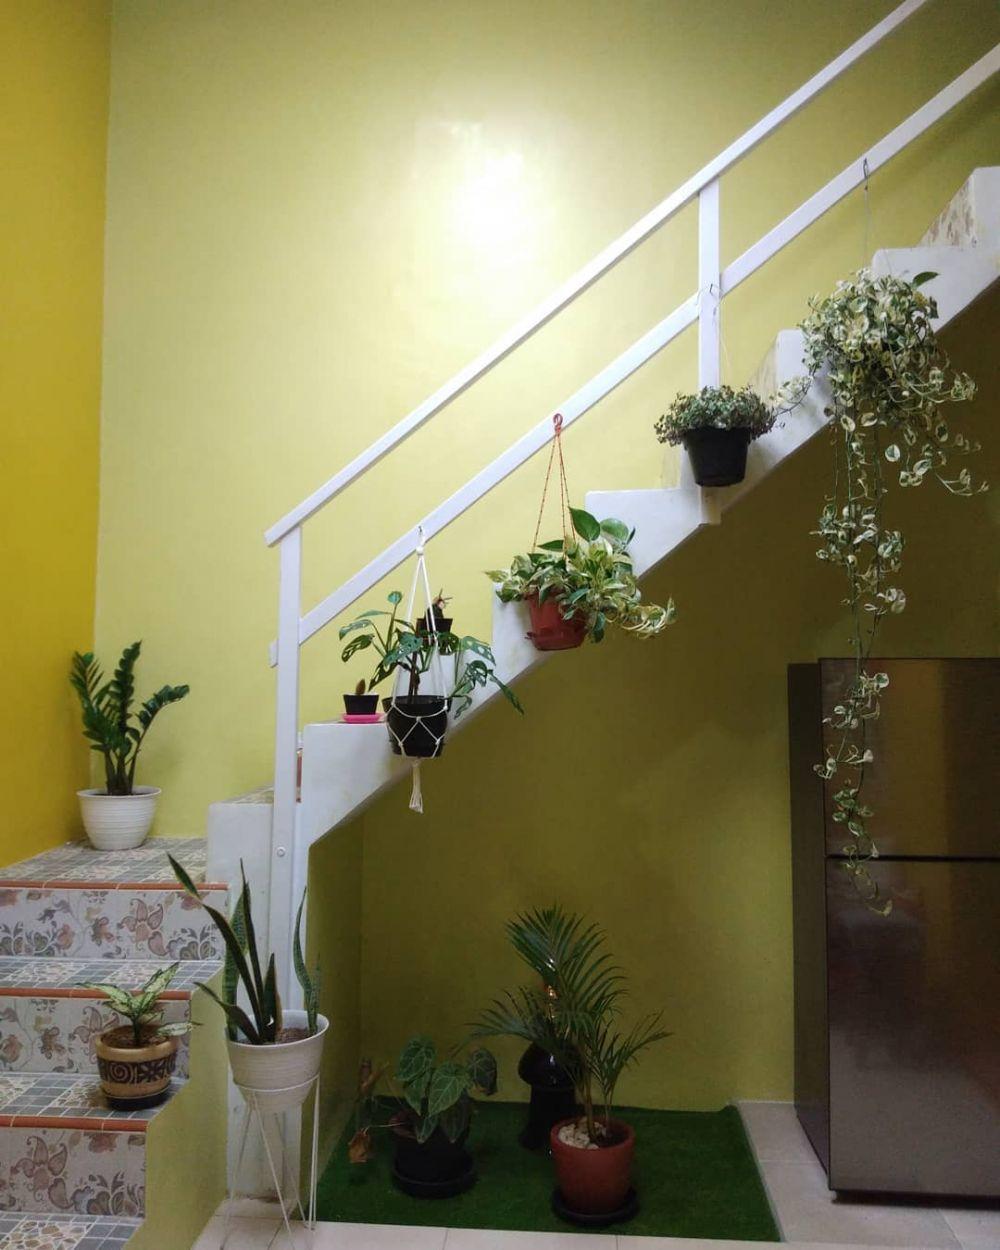 Desain Dapur Minimalis Di Bawah Tangga Cantik Jpg 768 505